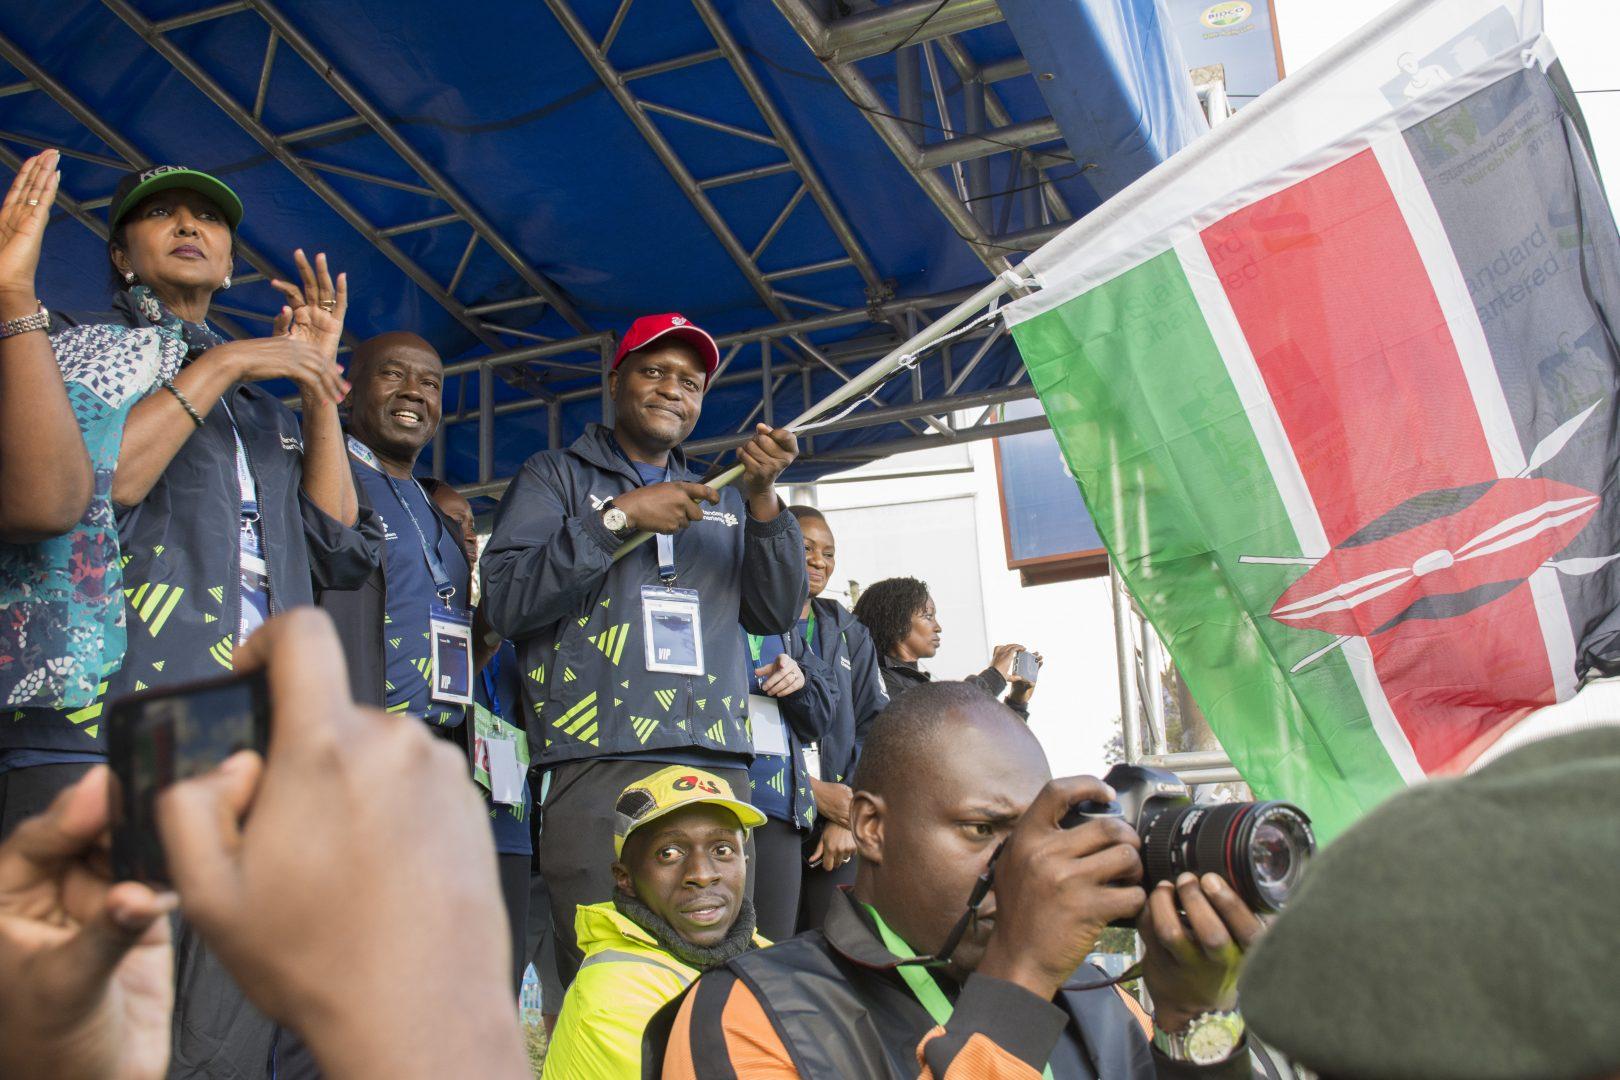 https://www.nairobimarathon.com/wp-content/uploads/2021/07/DSC_2978.jpg